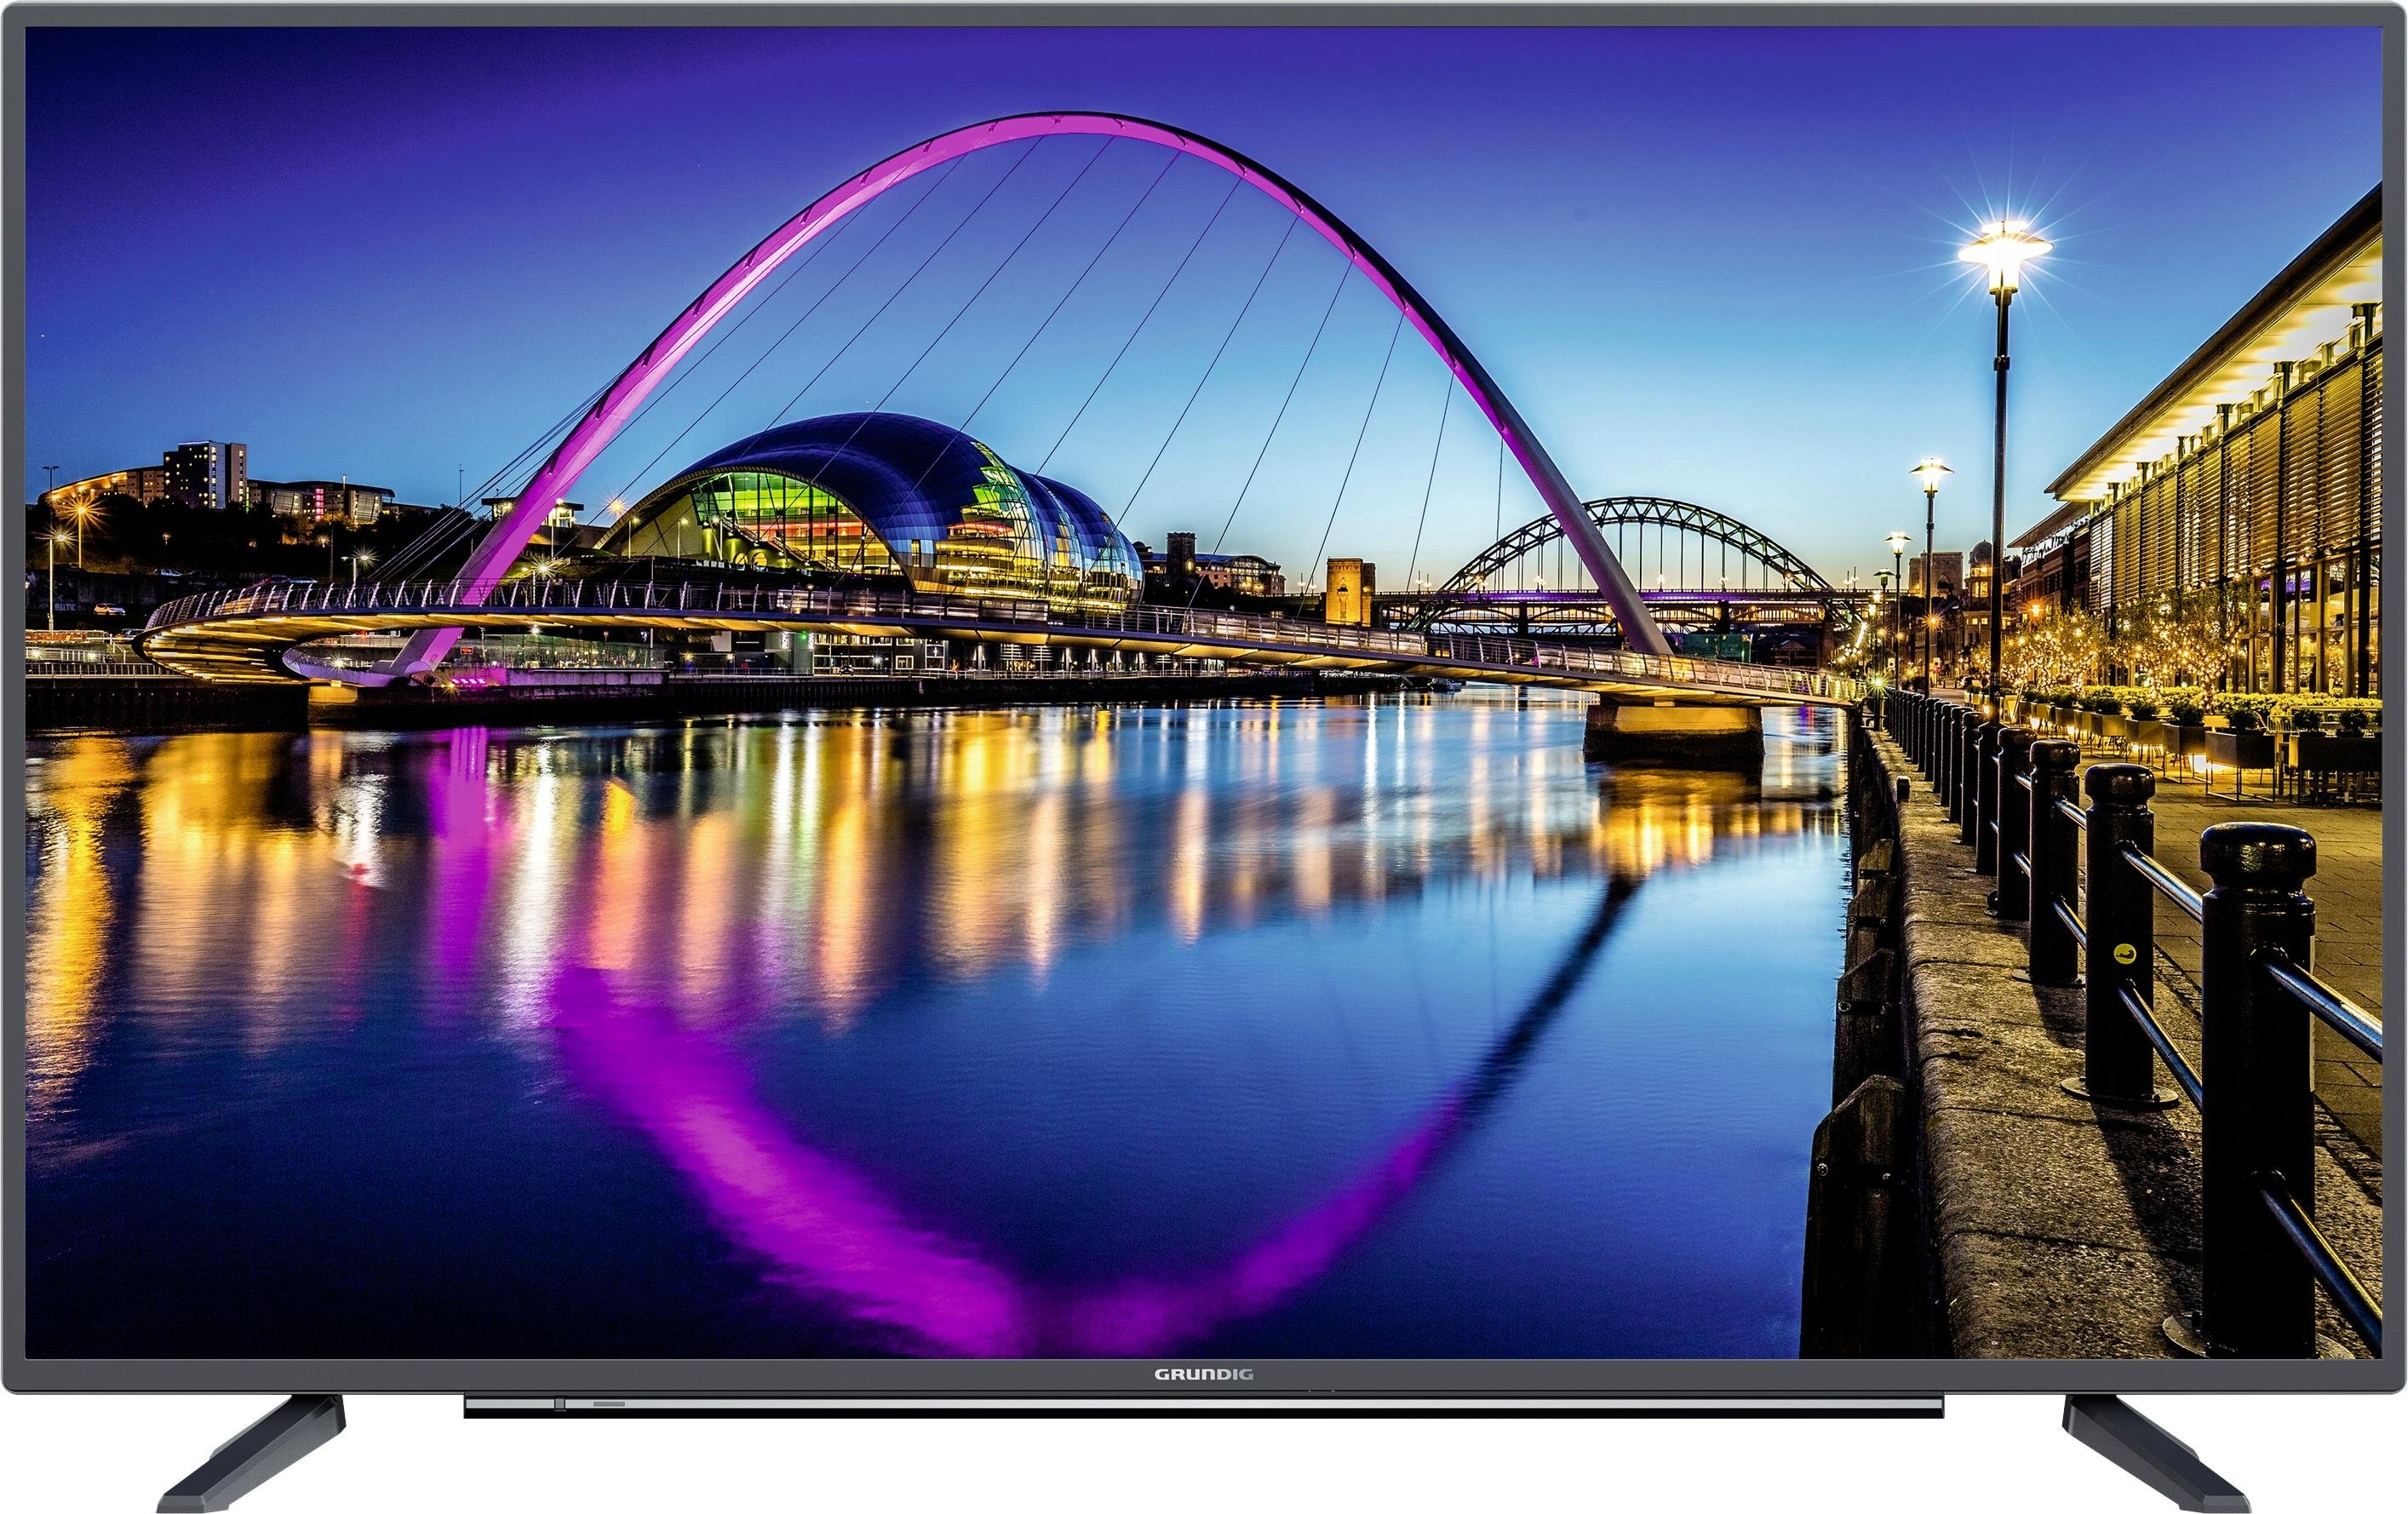 Grundig 32 GFT 6820 led-tv (32 inch), Full HD, smart-tv goedkoop op otto.nl kopen